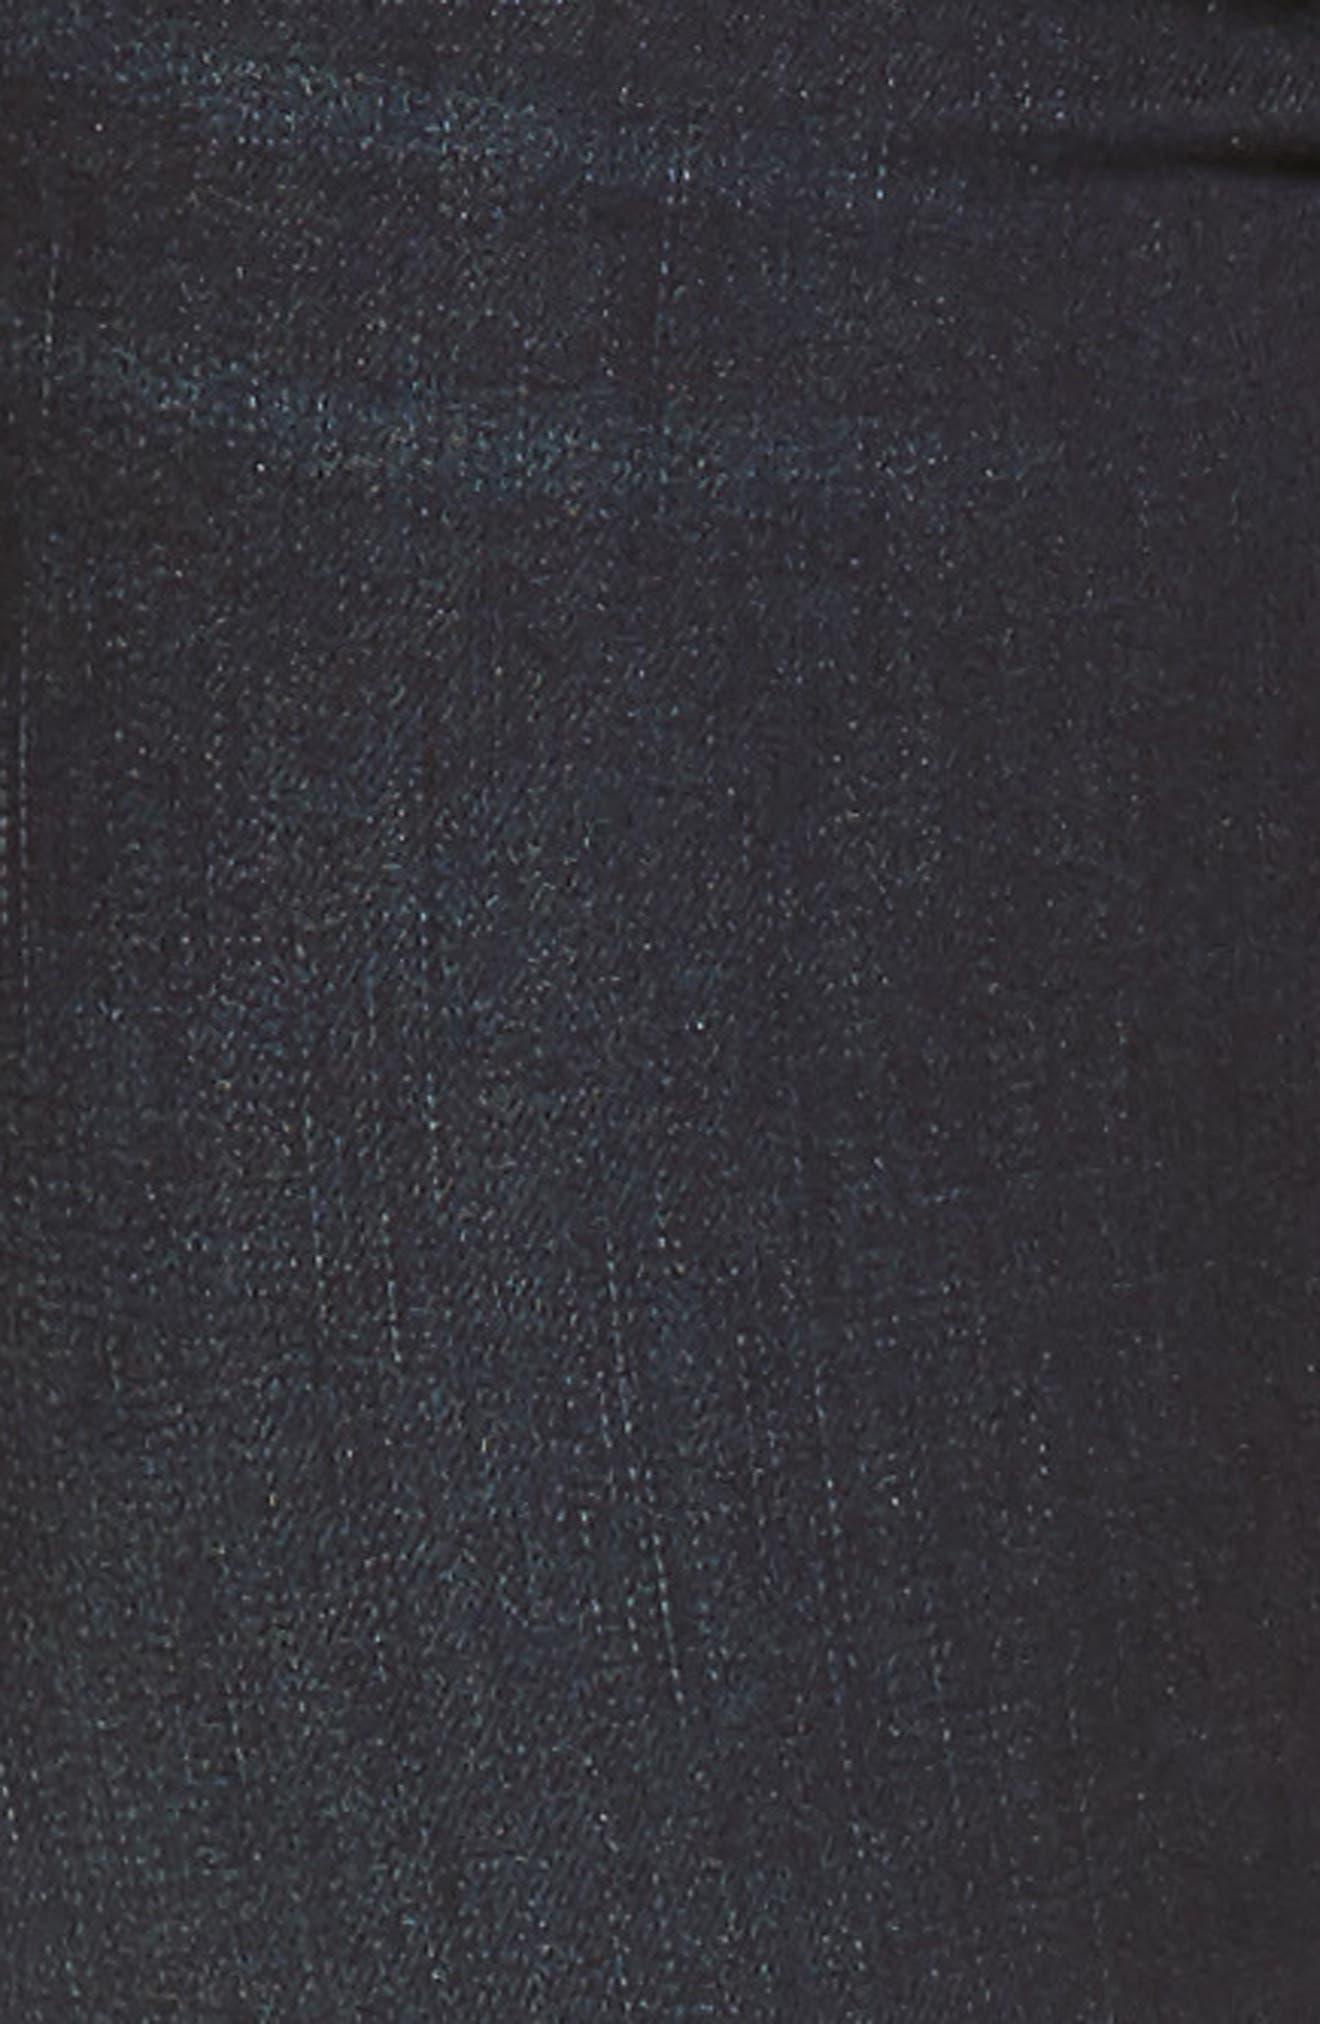 Connie Skinny Ankle Zip Hem Jeans,                             Alternate thumbnail 5, color,                             490